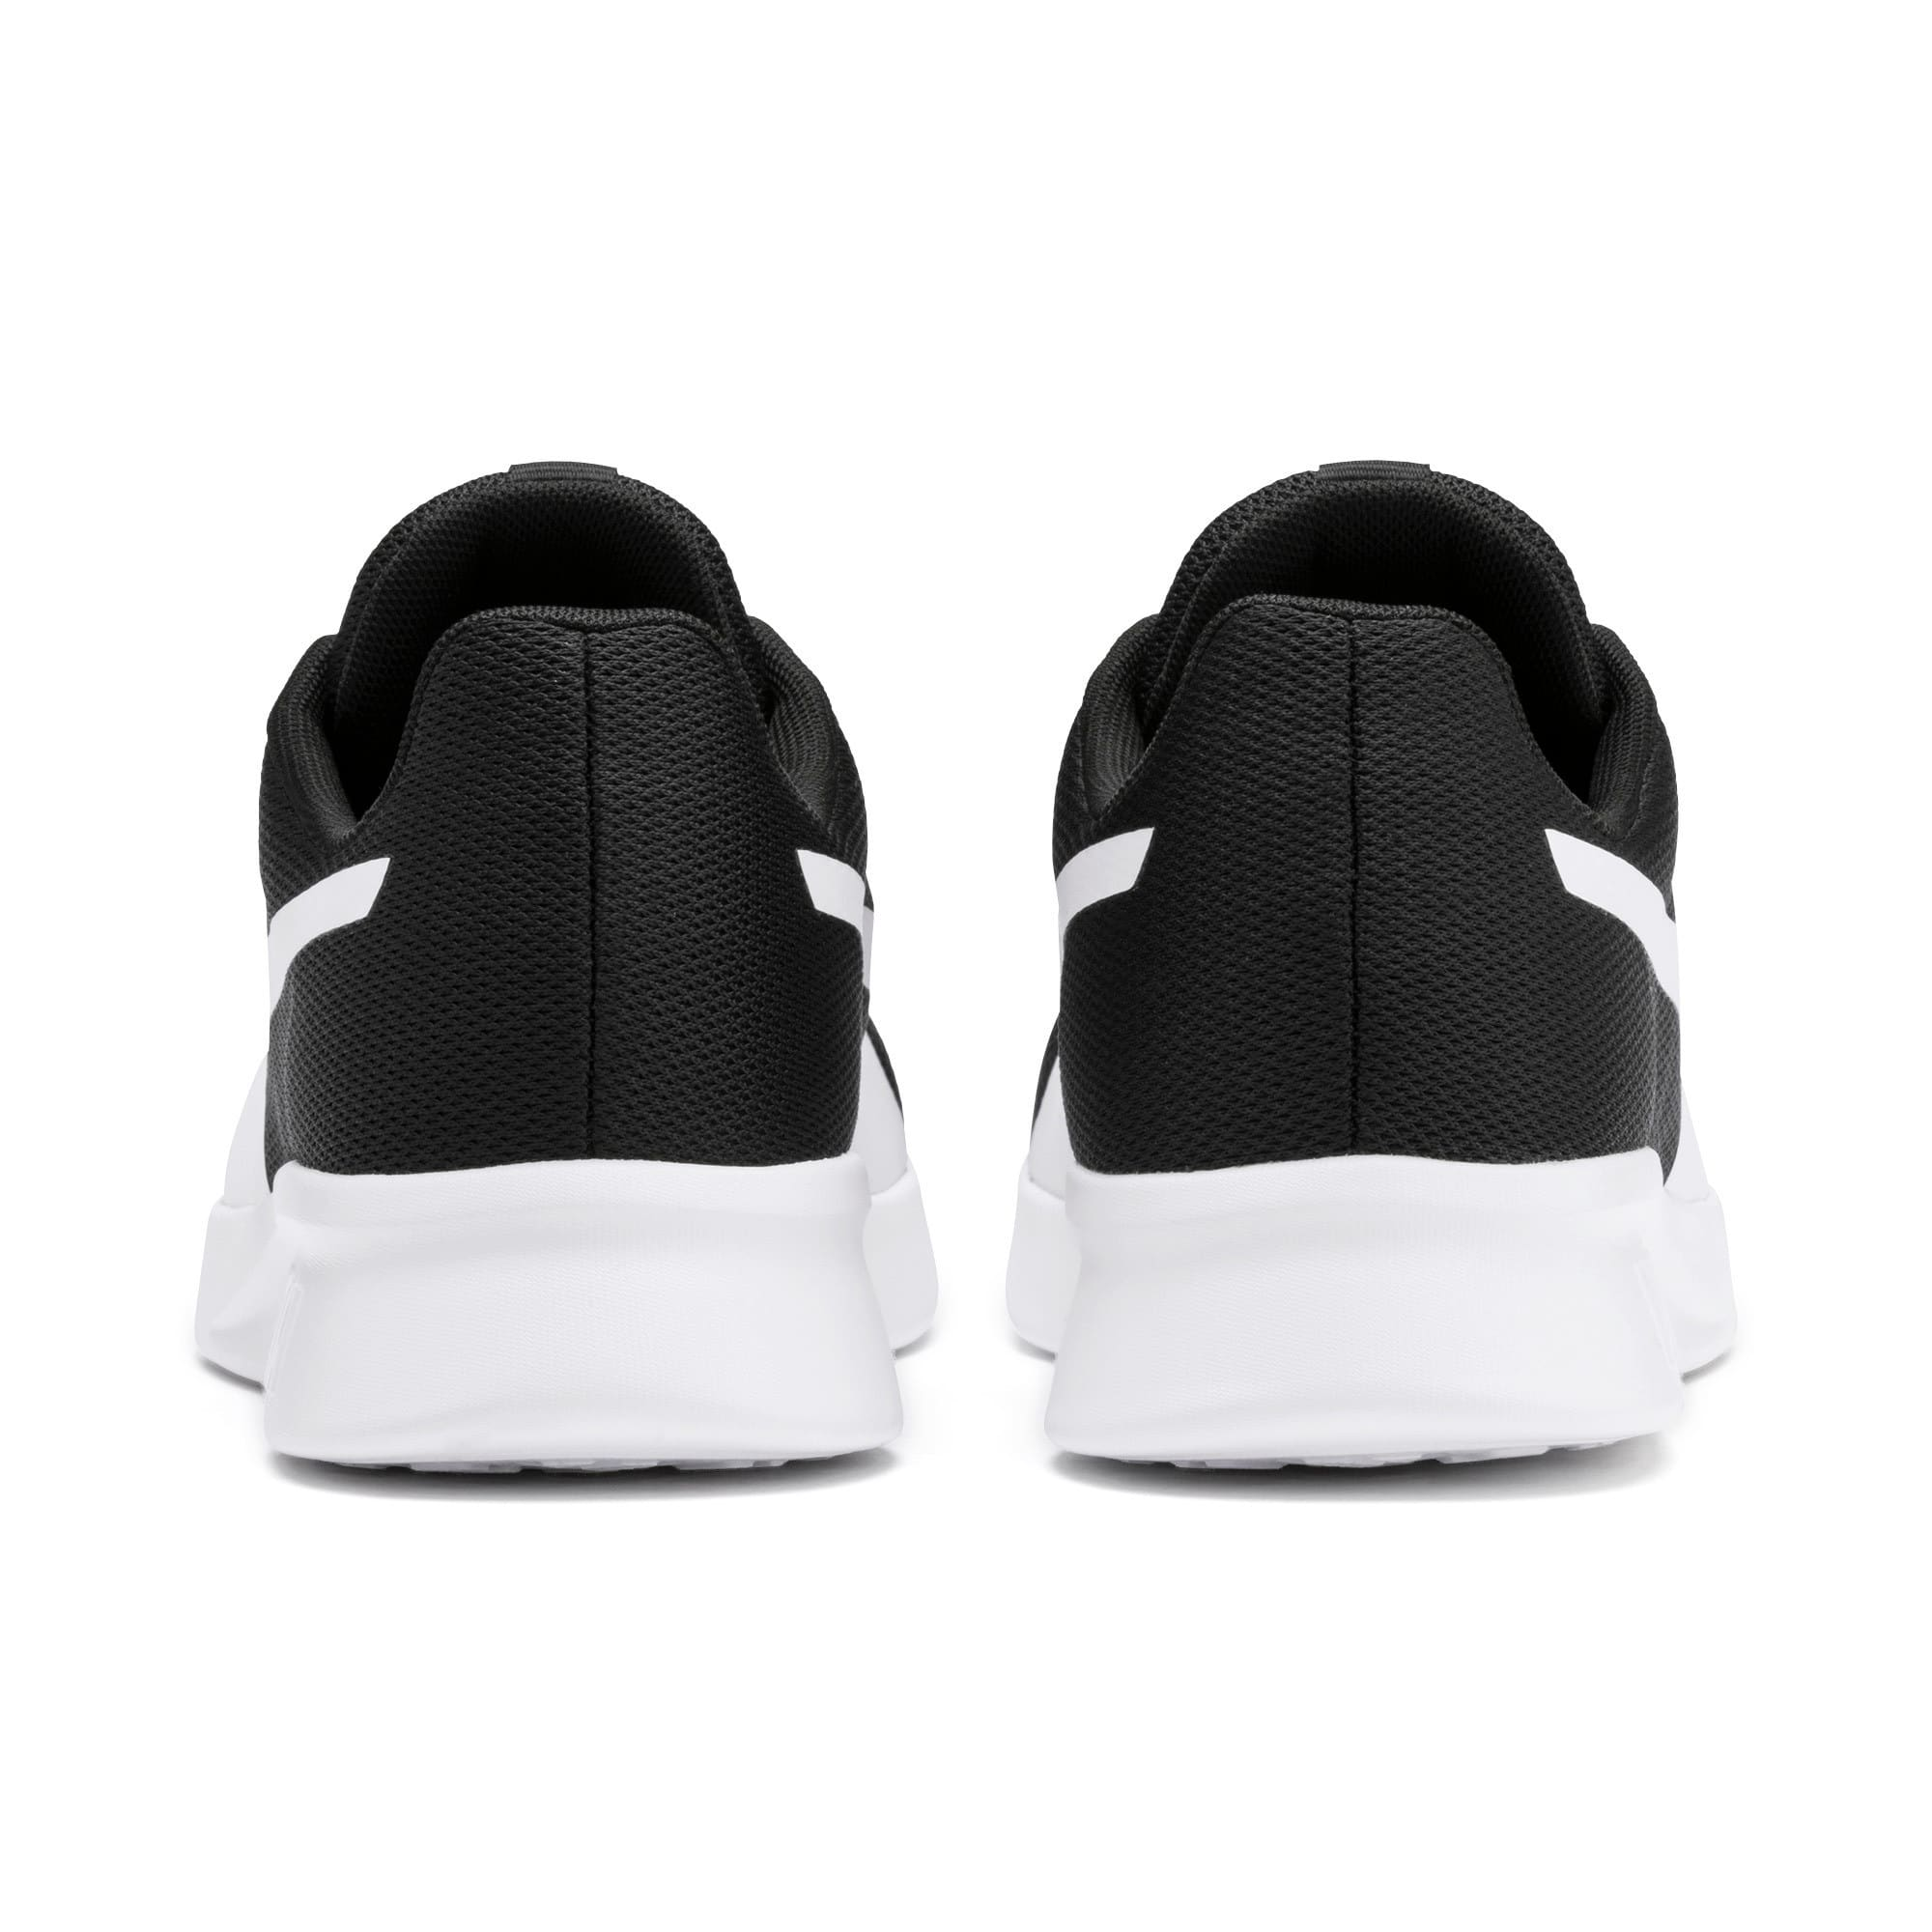 Thumbnail 5 of Modern Runner Sneakers, Puma Black-Puma White, medium-IND